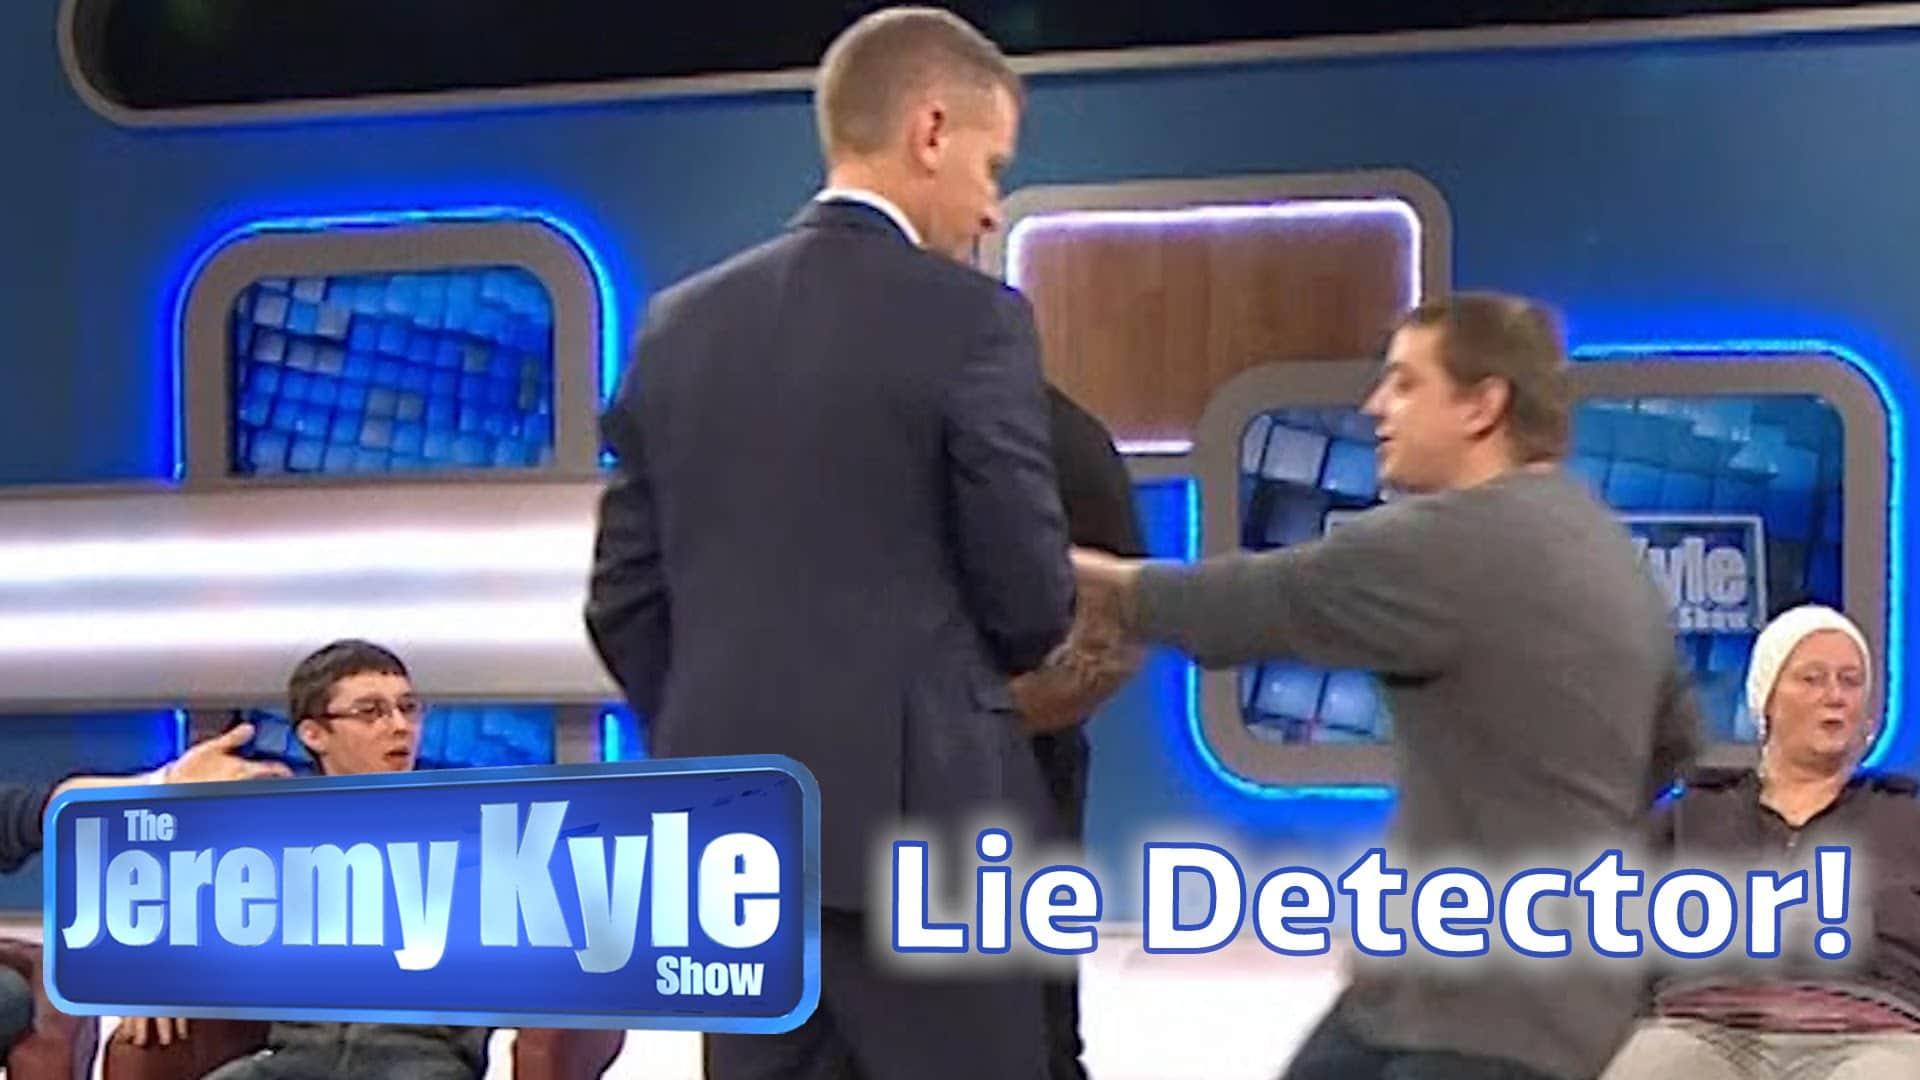 Professional Lie Detector Test vs Going on the Jeremy Kyle Show Lie Detector Test